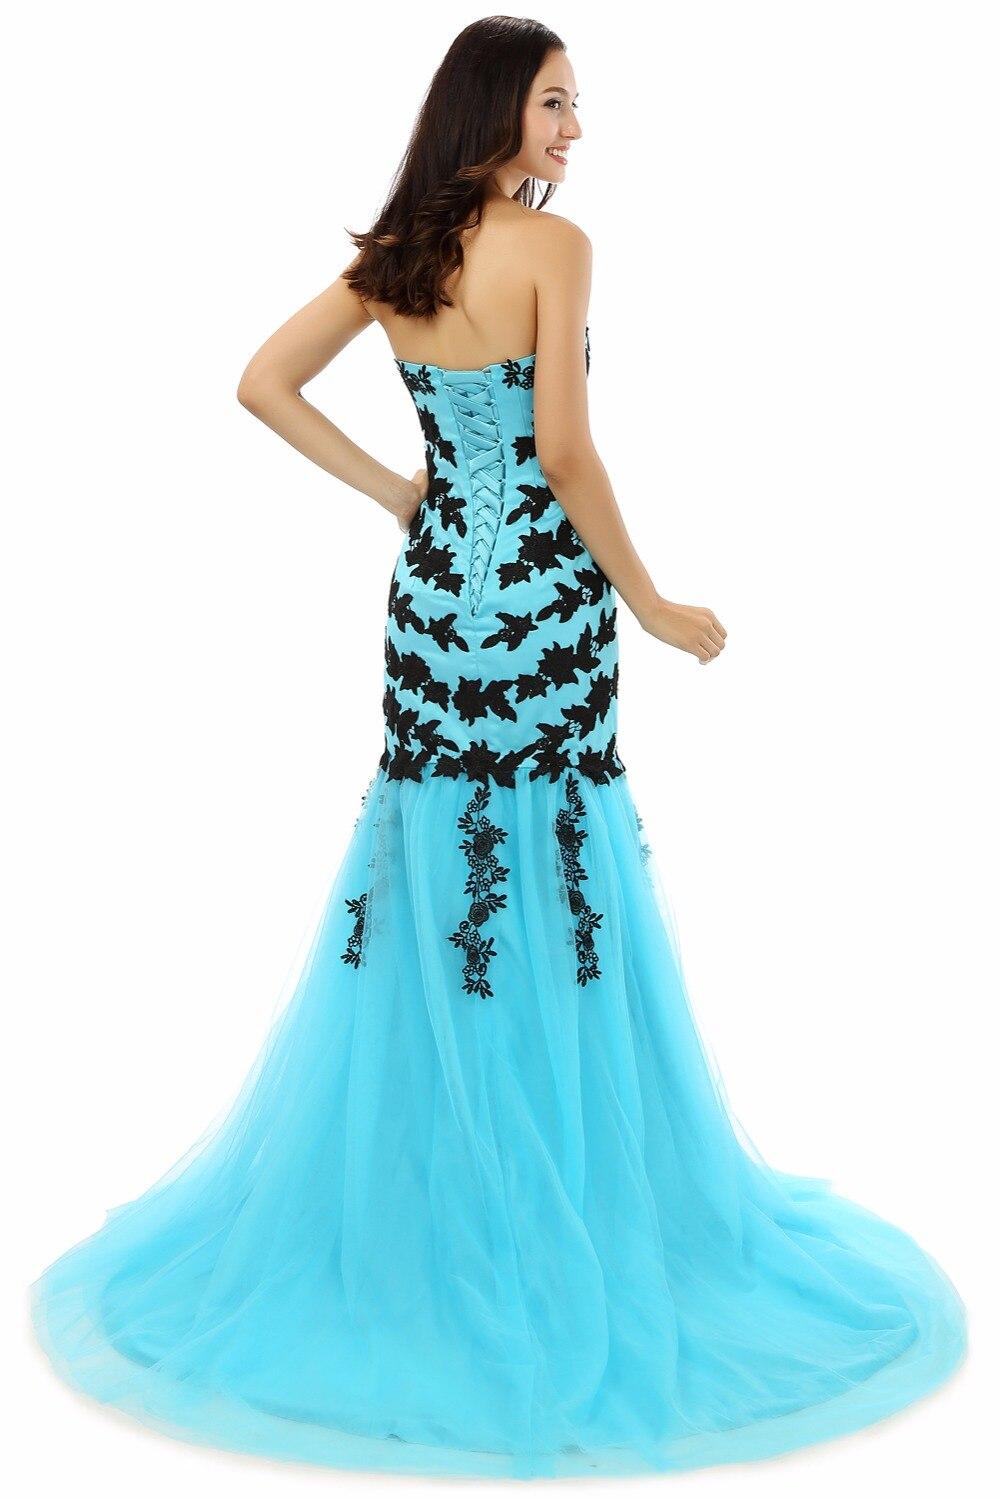 H&S BRIDAL Tulle Mermaid Evening Prom Dresses Long Black Lace ...